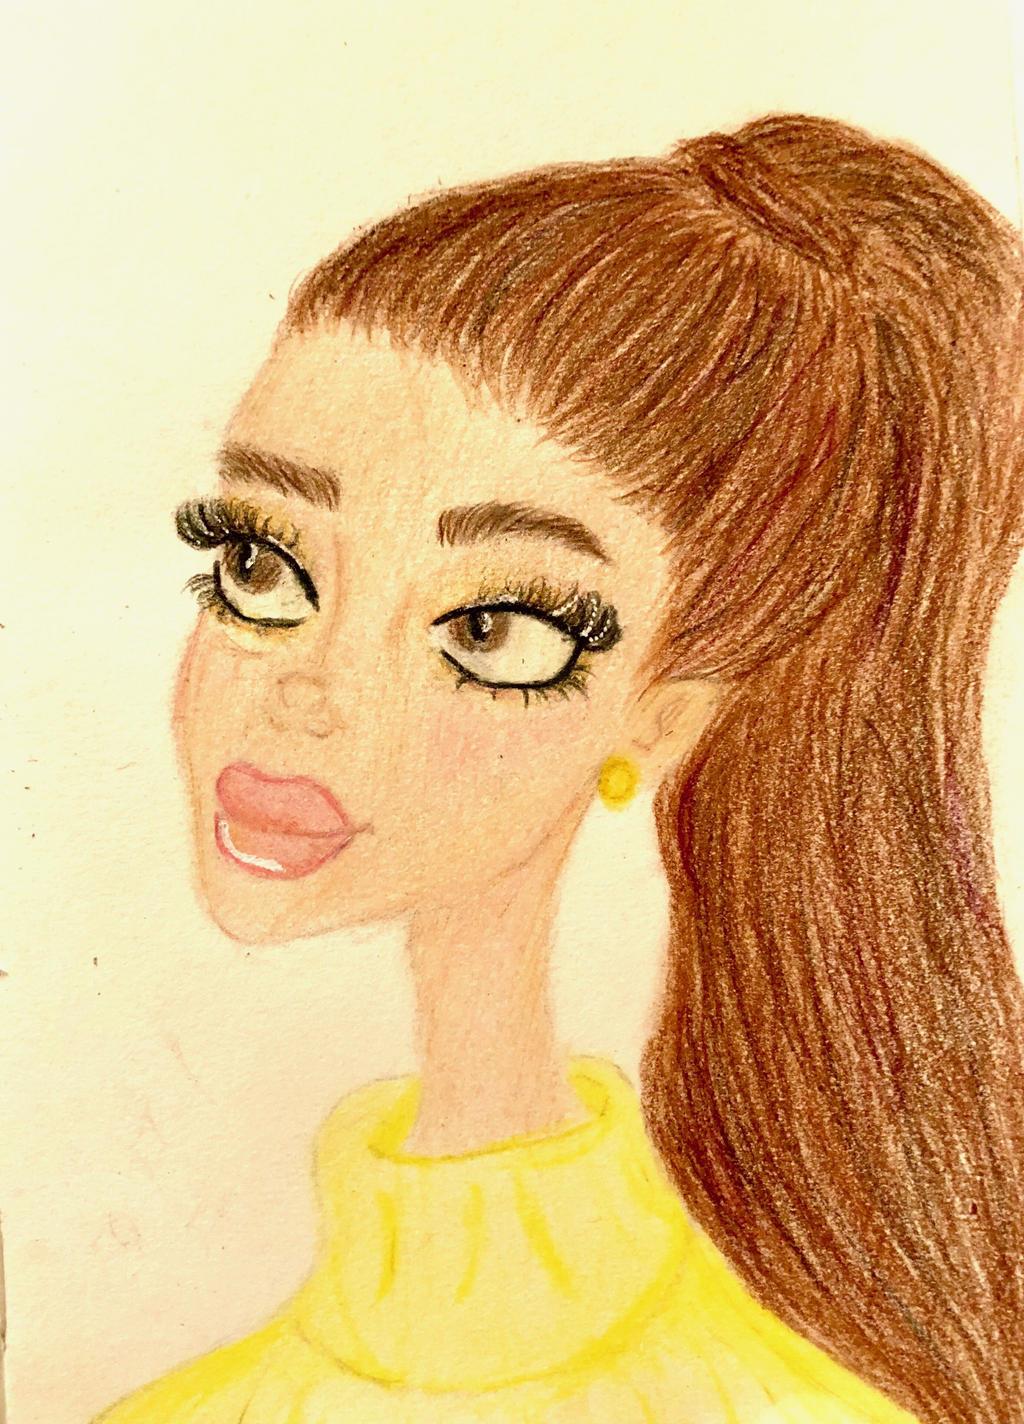 Ariana Grande Cartoon By Masbro7 On Deviantart